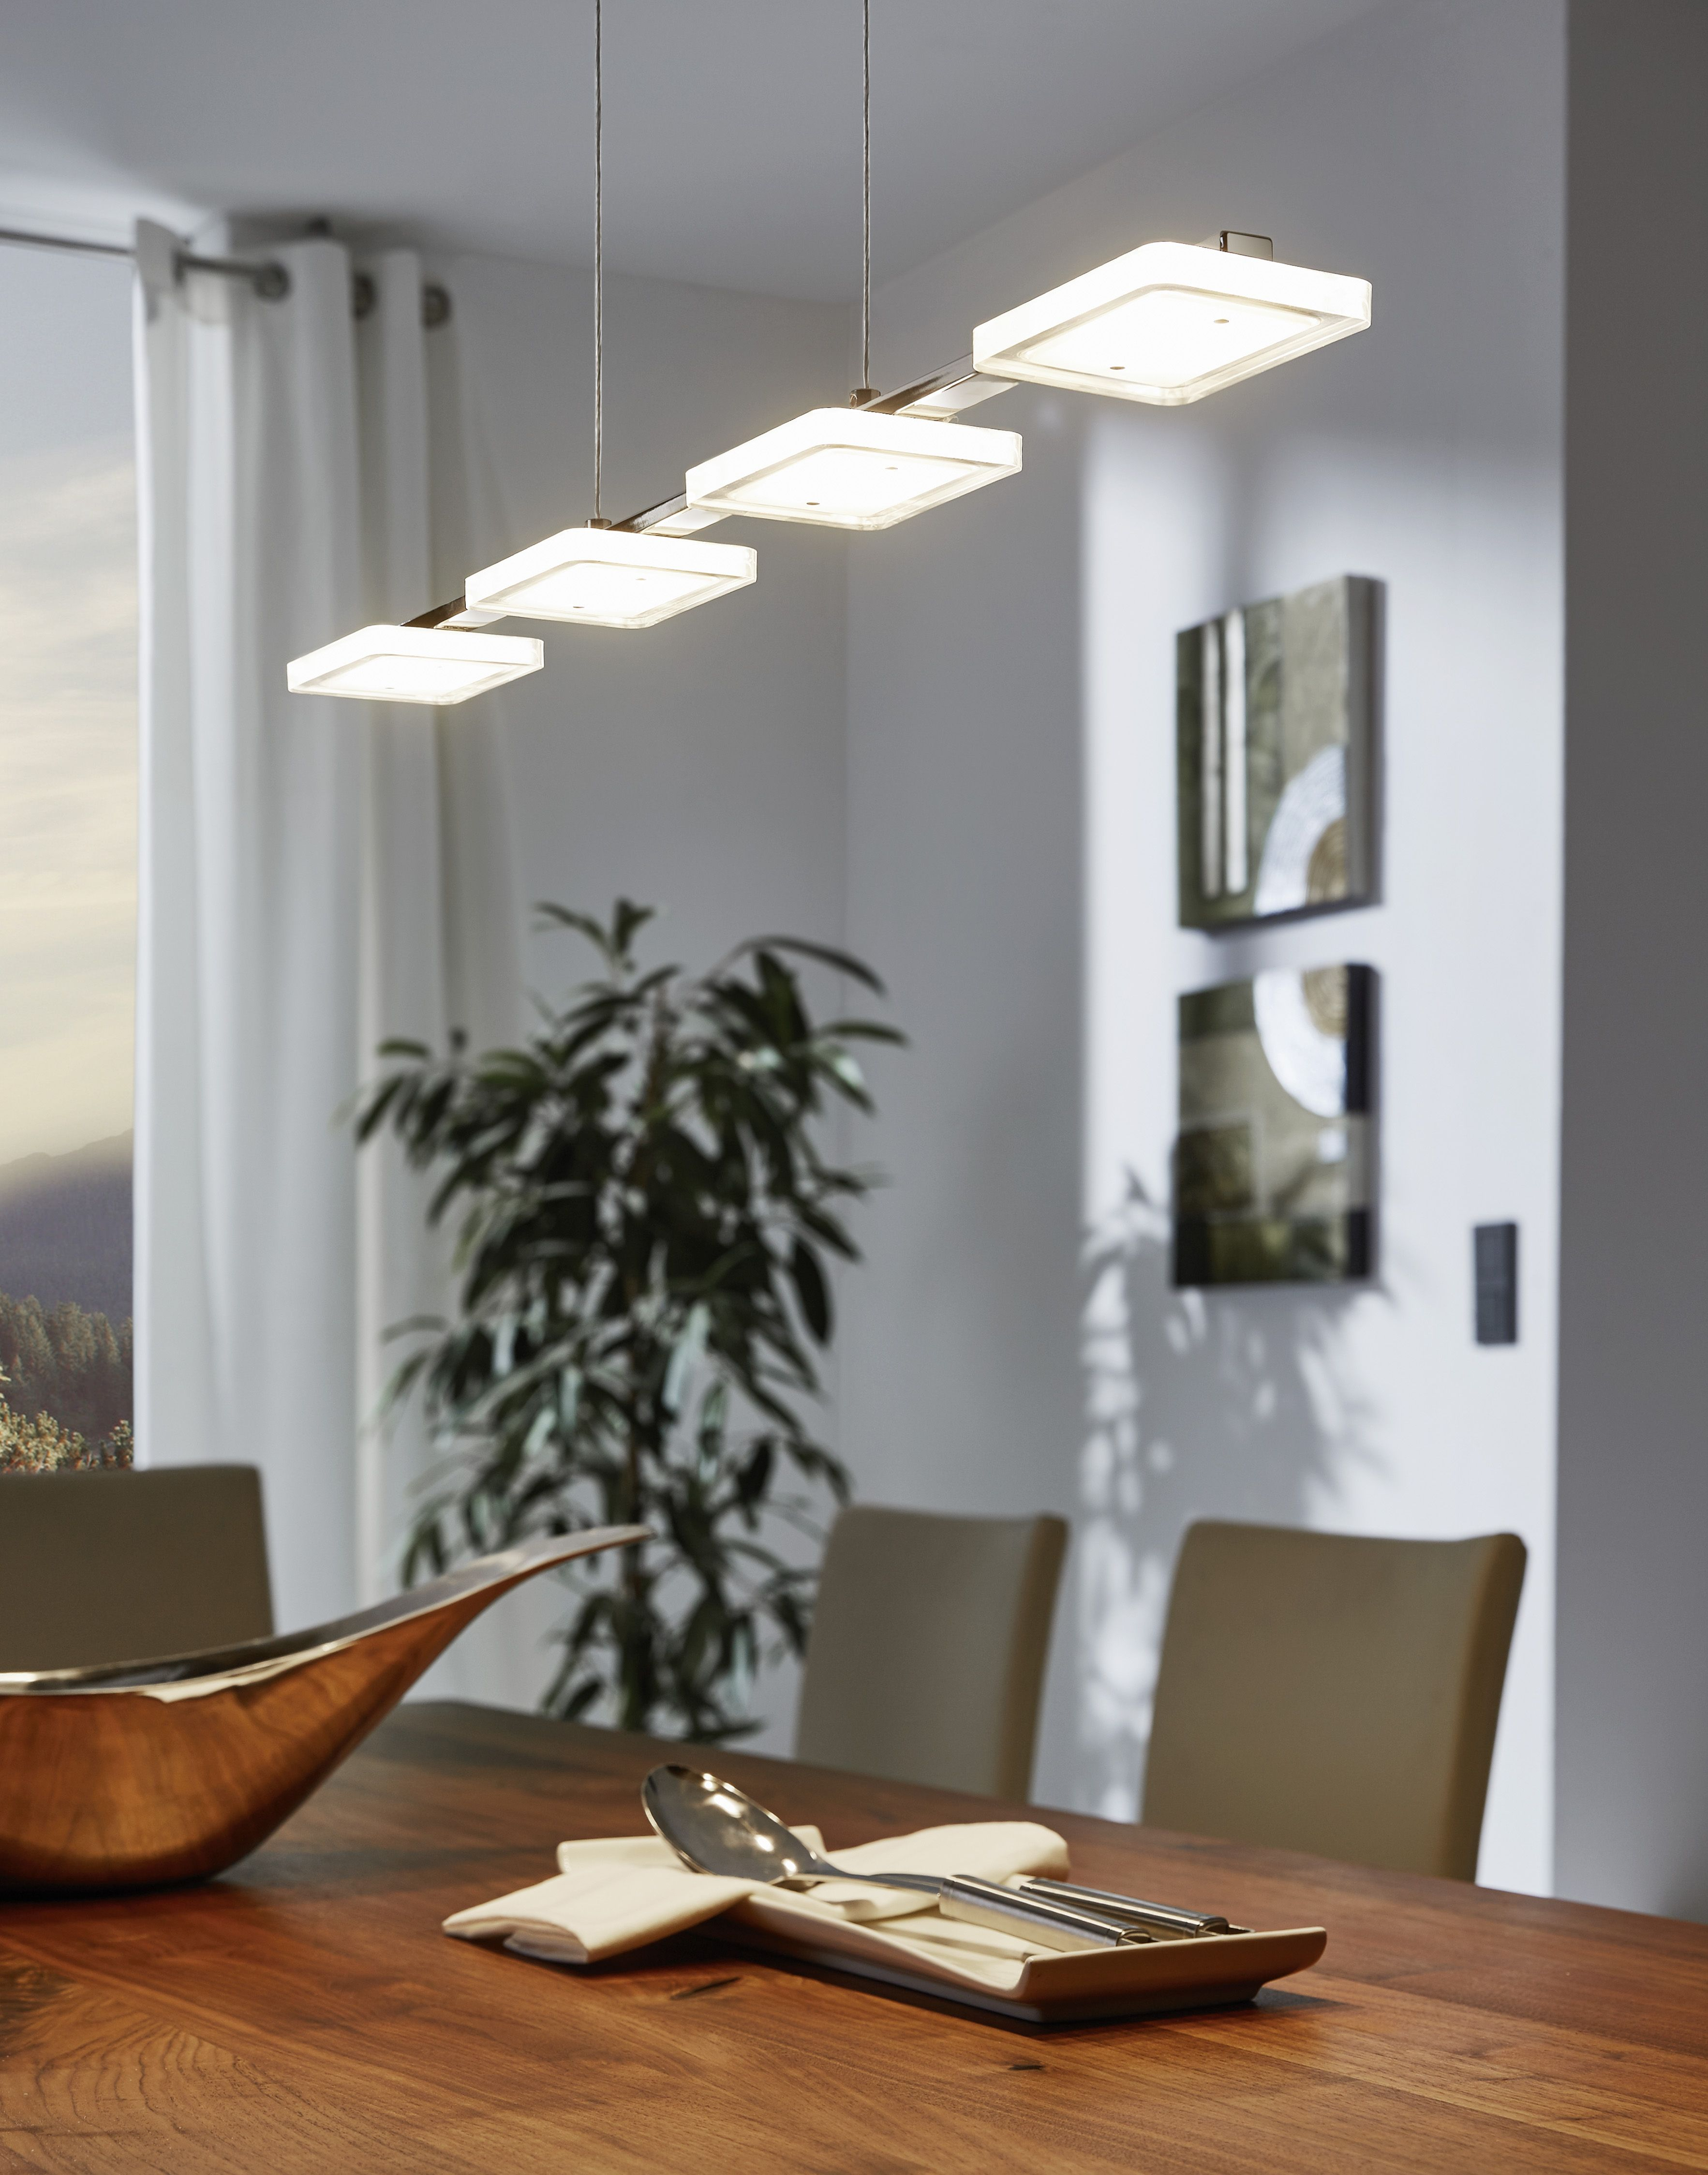 eglo matt light floor lighting lamp nickel in australia troy